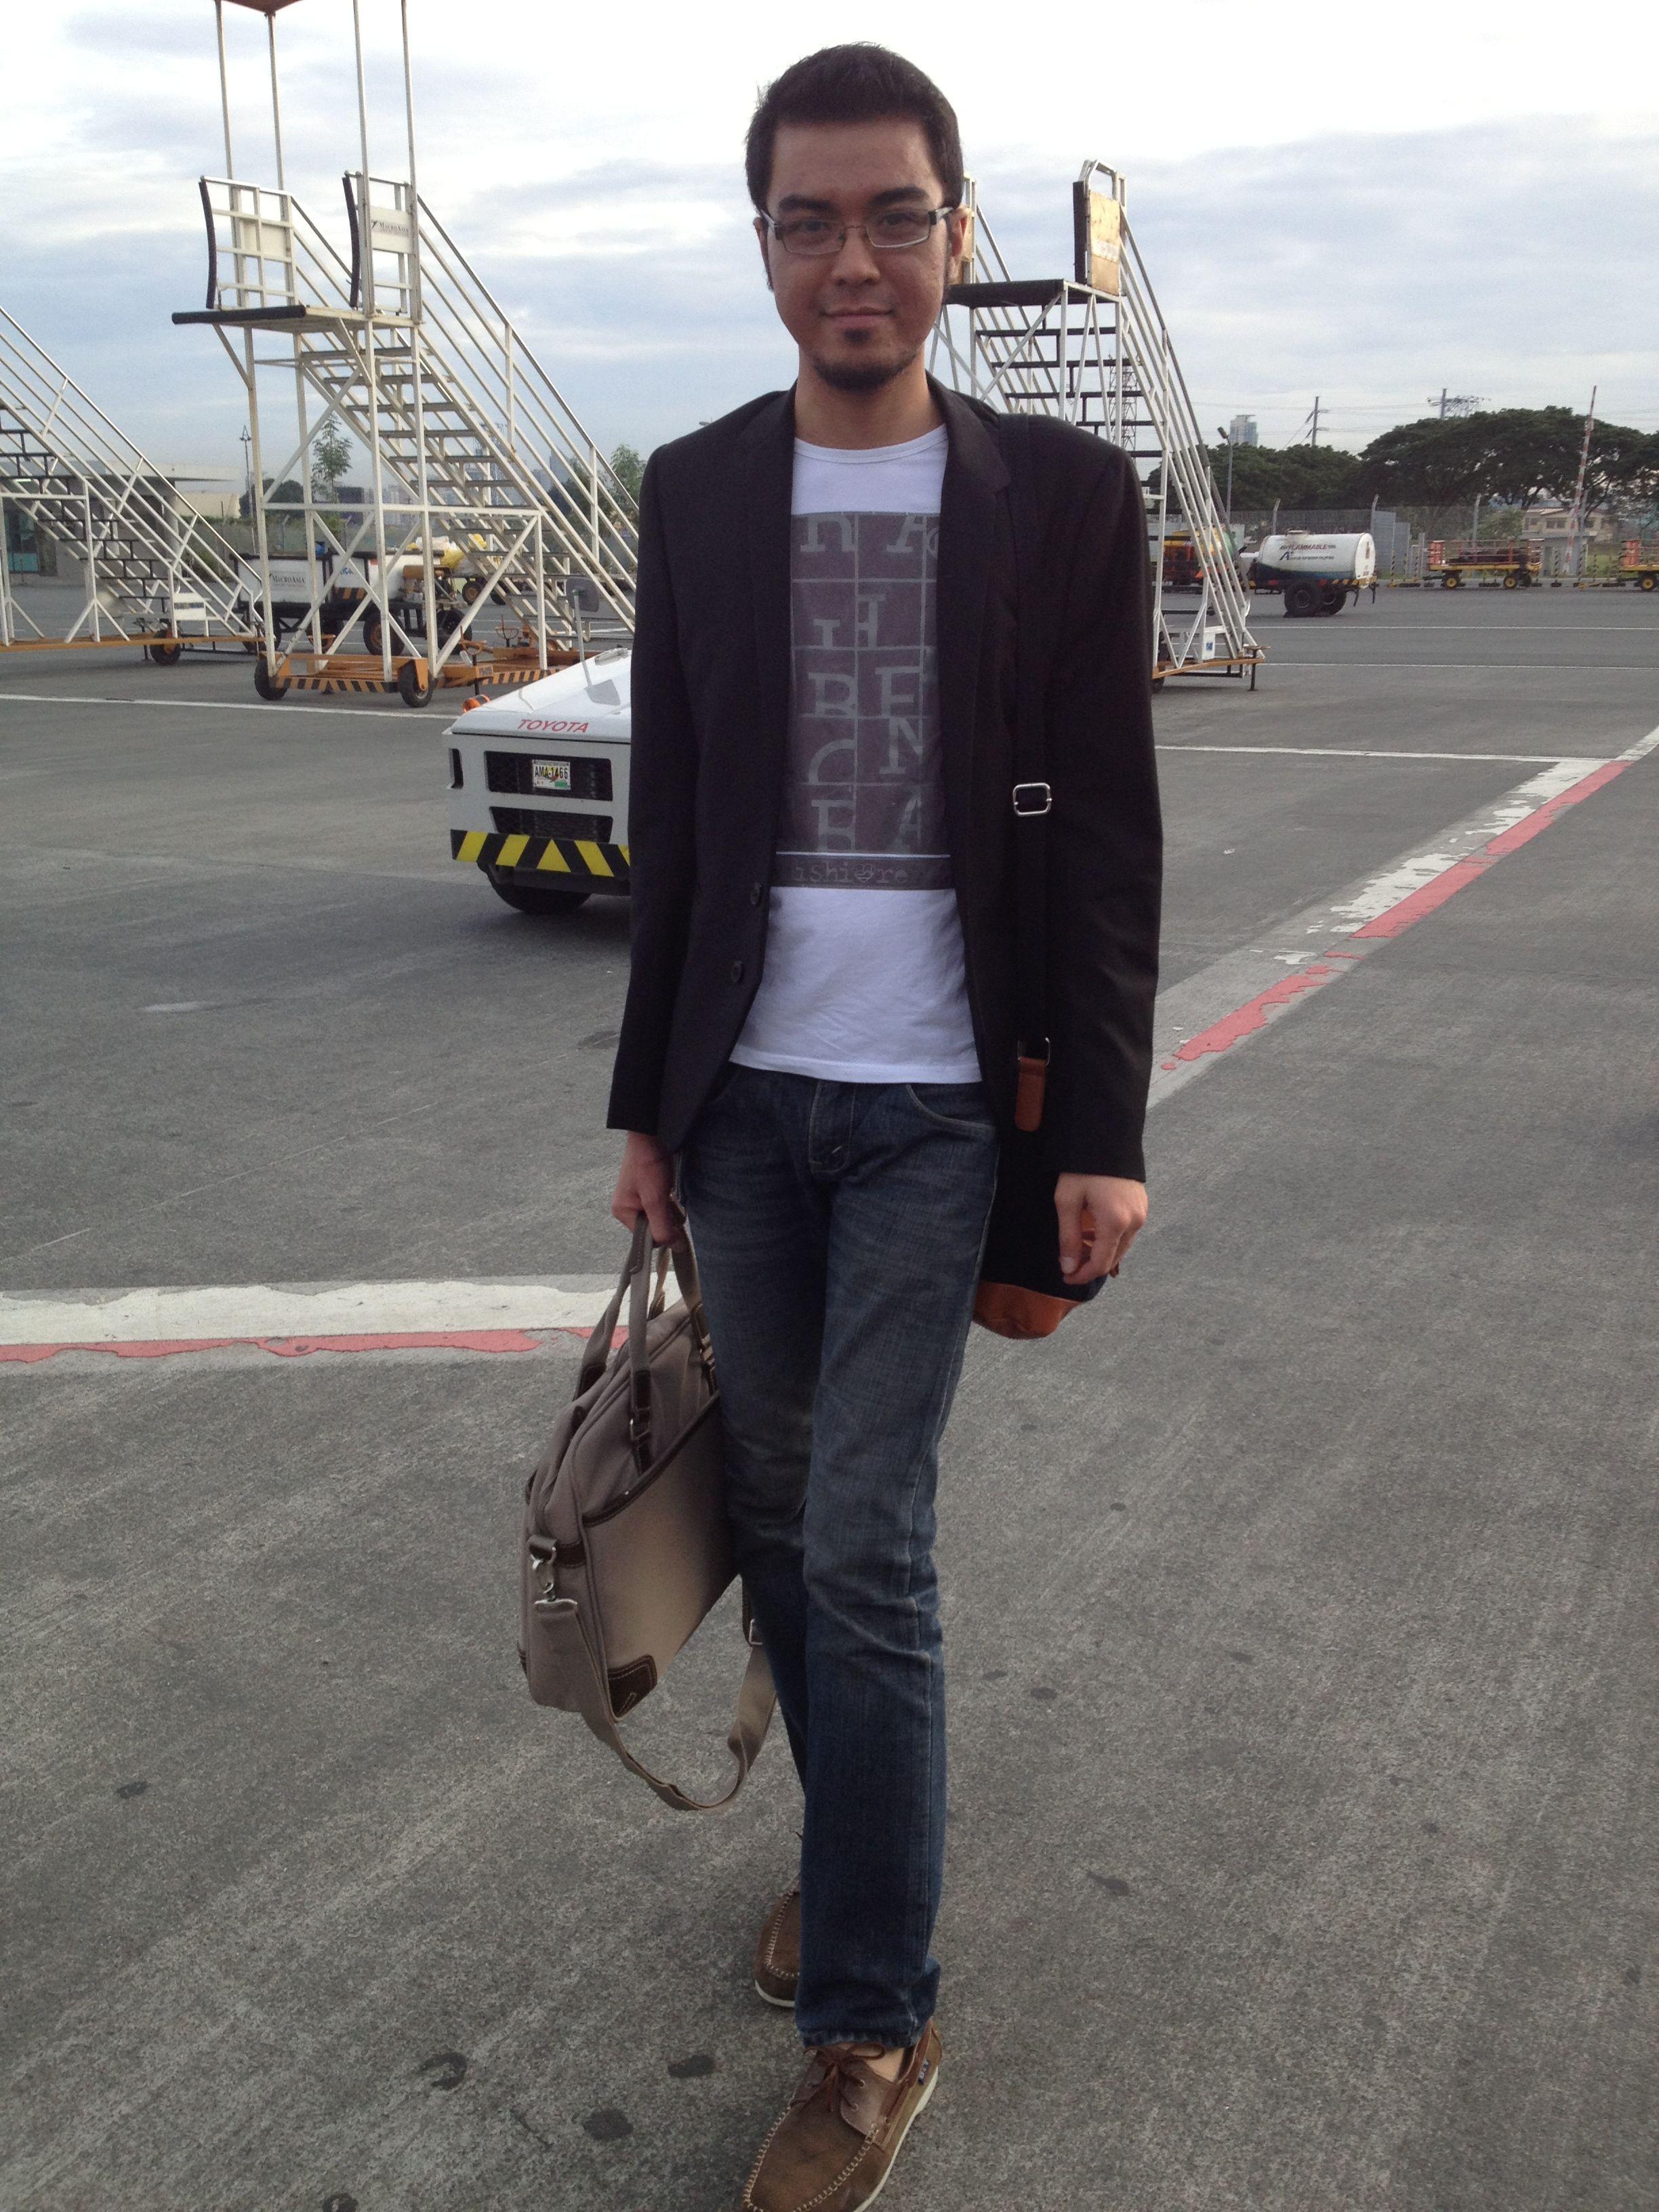 216049ff7b49 Black jacket white printed shirt blue jeans brown boat shoes jpg 2448x3264  Black jacket shoes